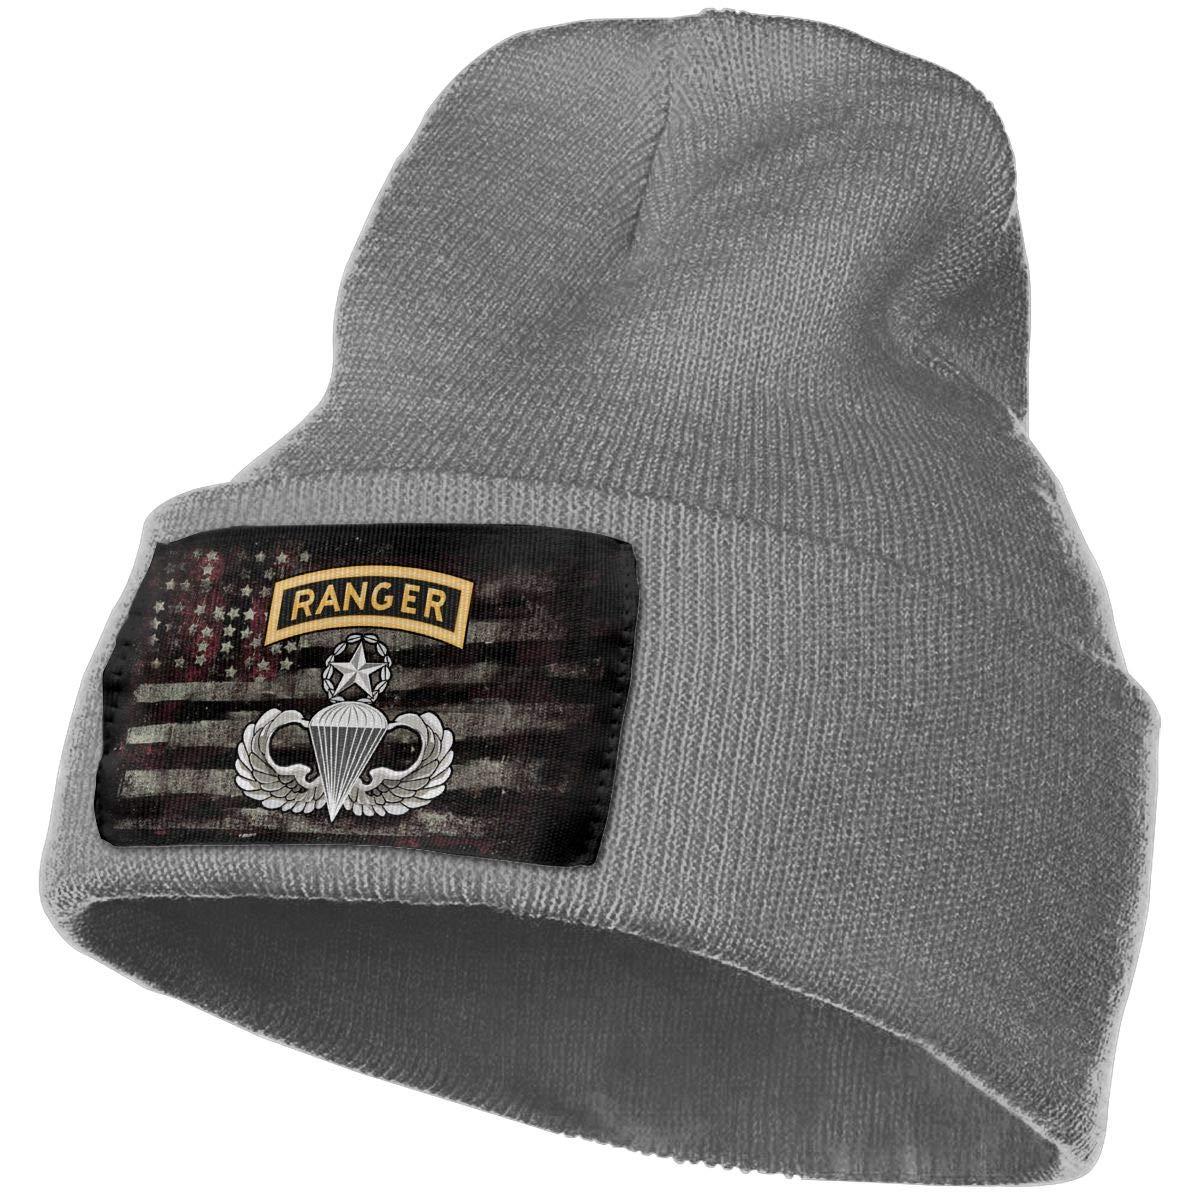 FORDSAN CP Master Parachutist with Ranger Tab License Mens Beanie Cap Skull Cap Winter Warm Knitting Hats.